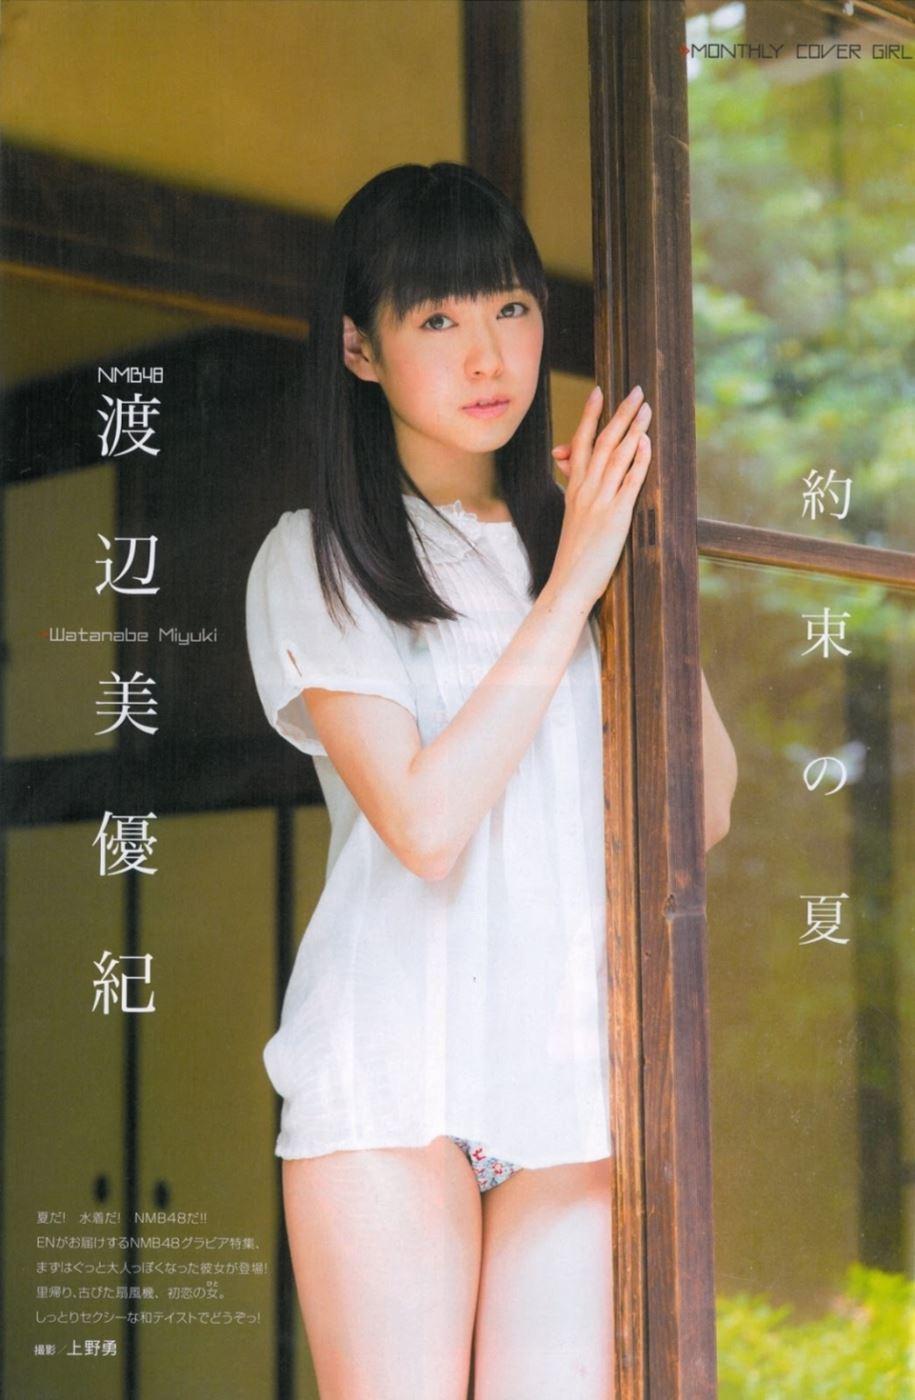 渡辺美優紀 エロ画像 12